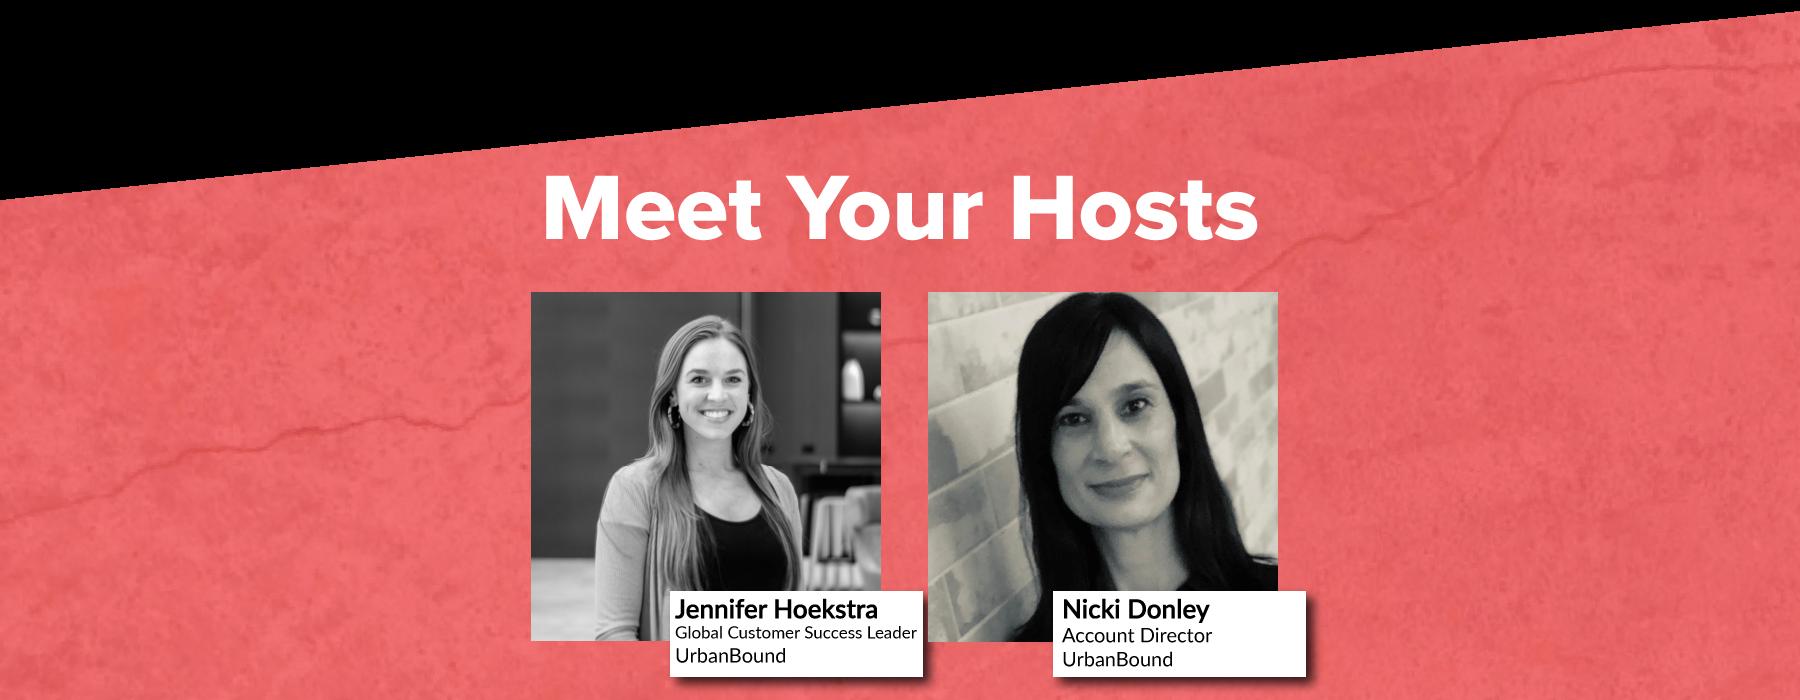 Meet-Your-Hosts---Internal-Transferees